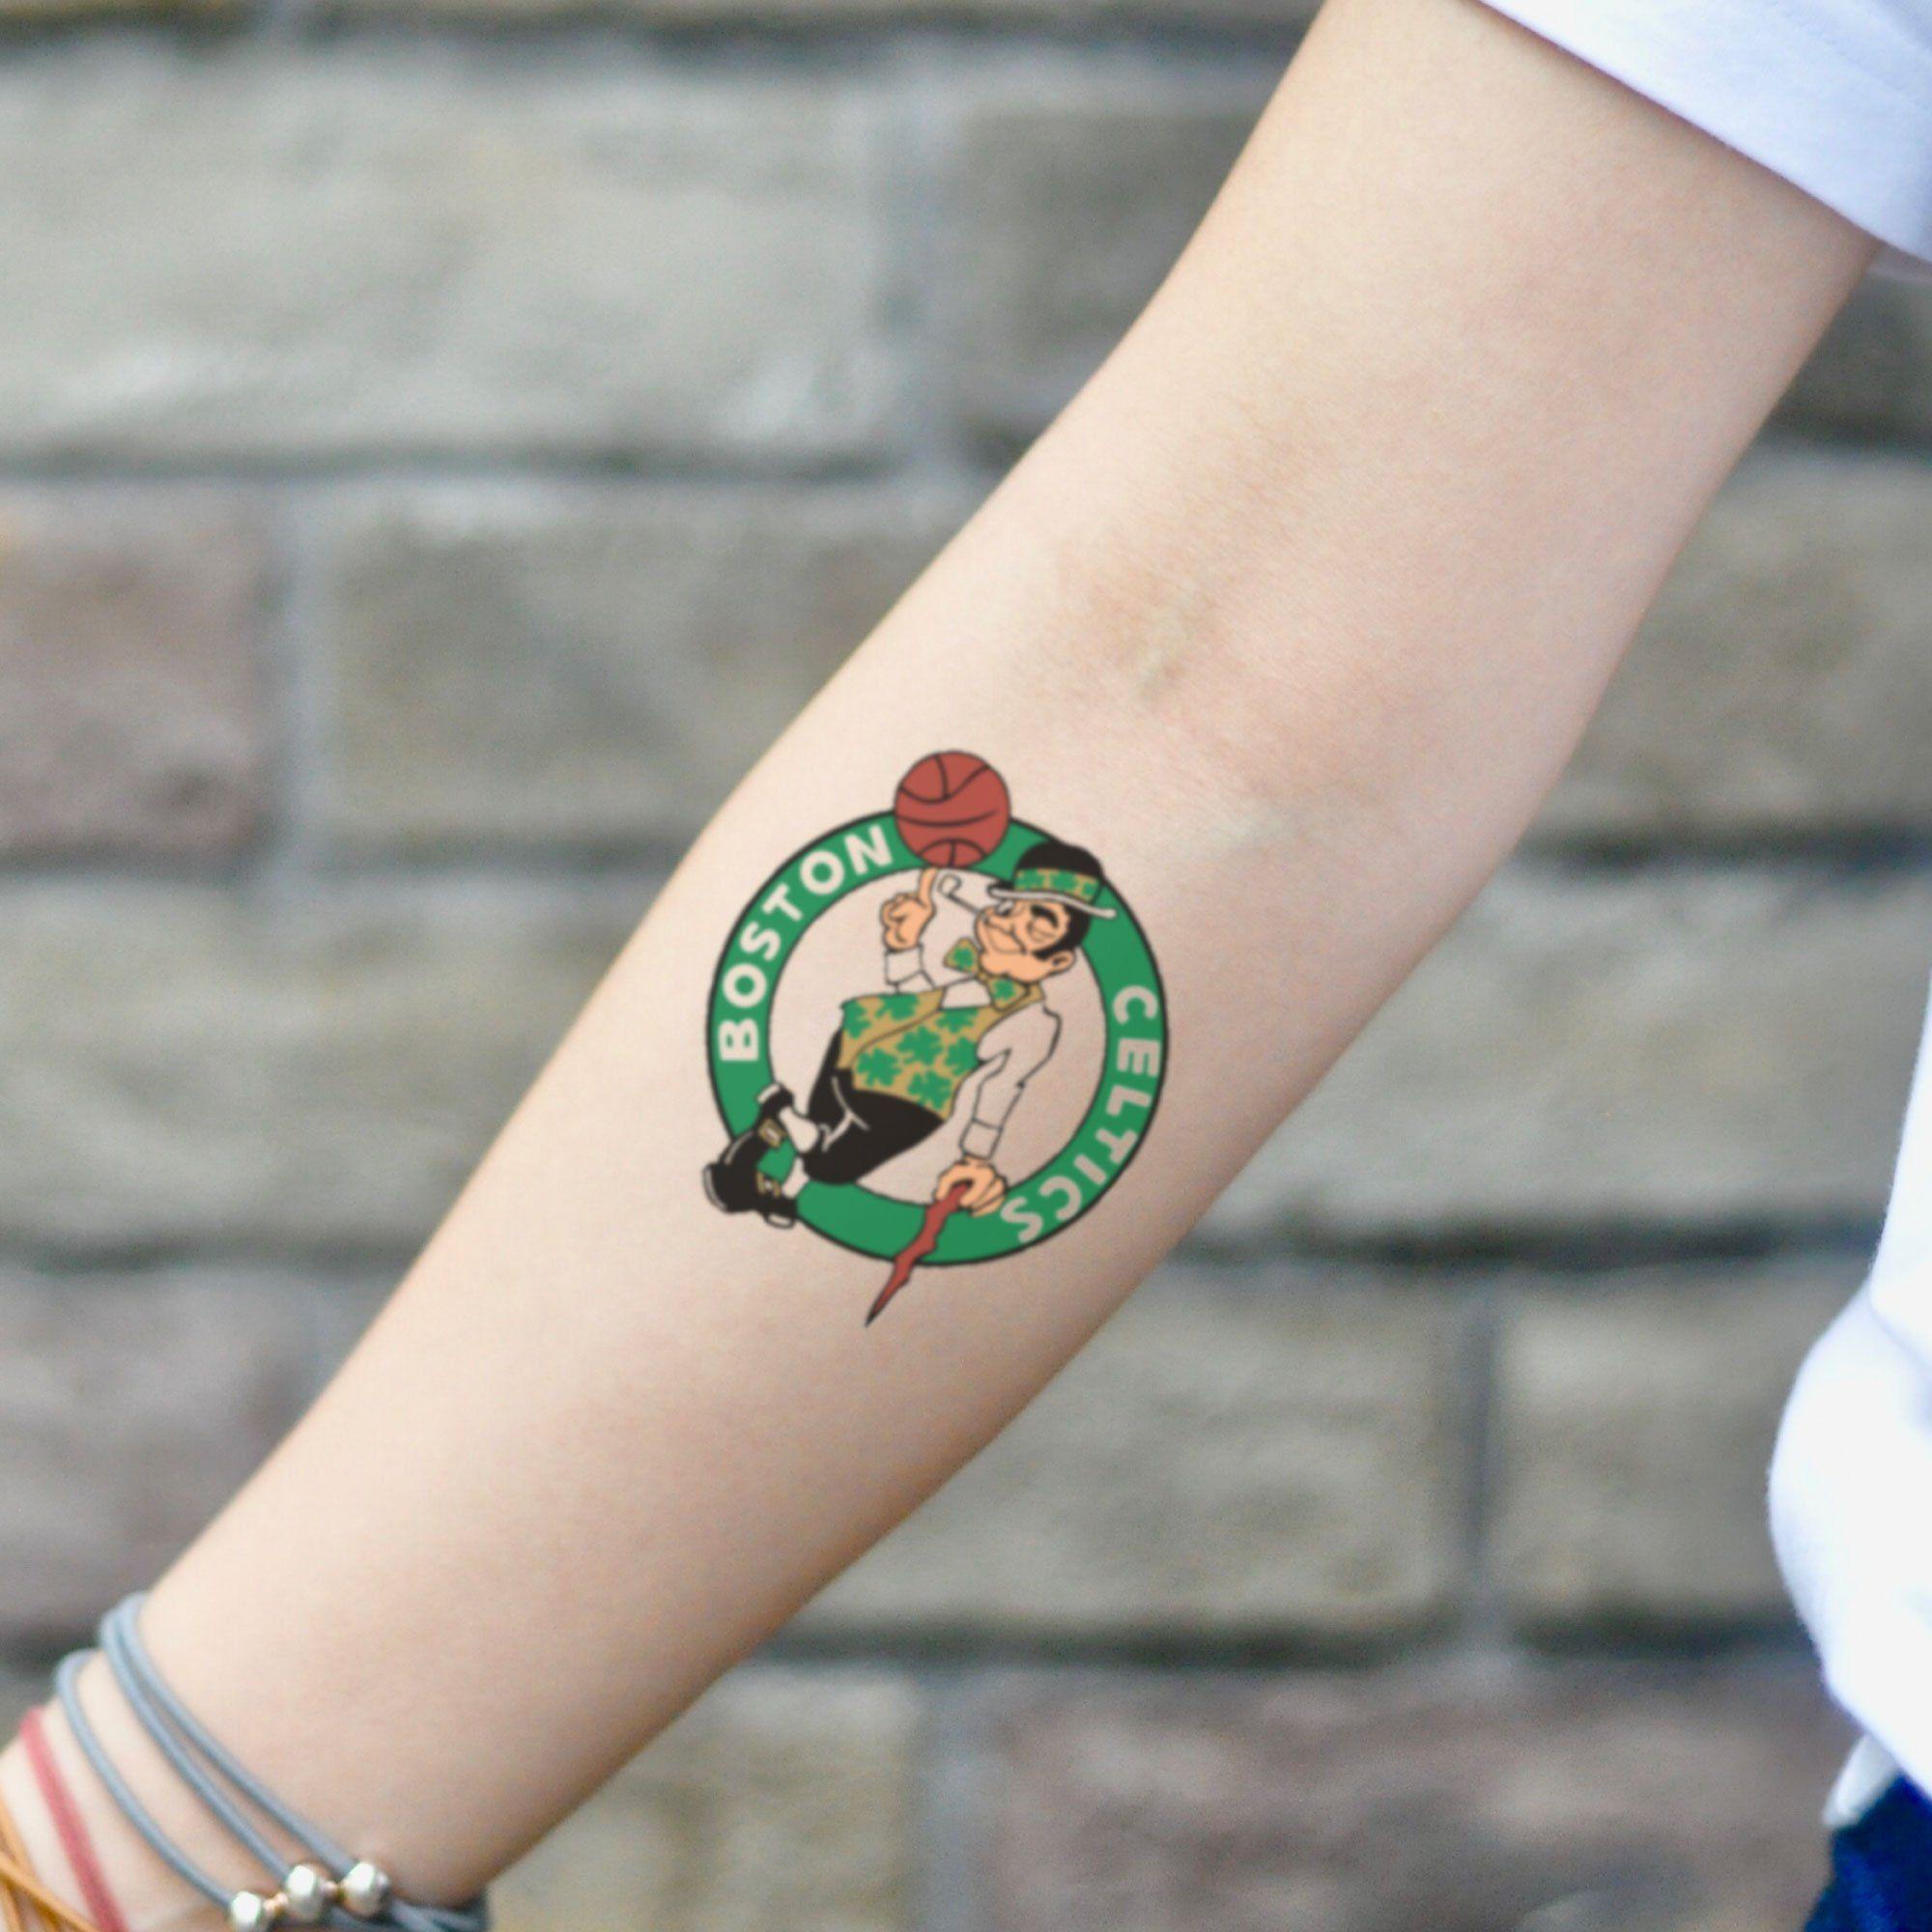 Boston Celtics Temporary Tattoo Sticker Set Of 2 Tattoos Tattoos For Guys Tattoo Stickers [ 2000 x 2000 Pixel ]